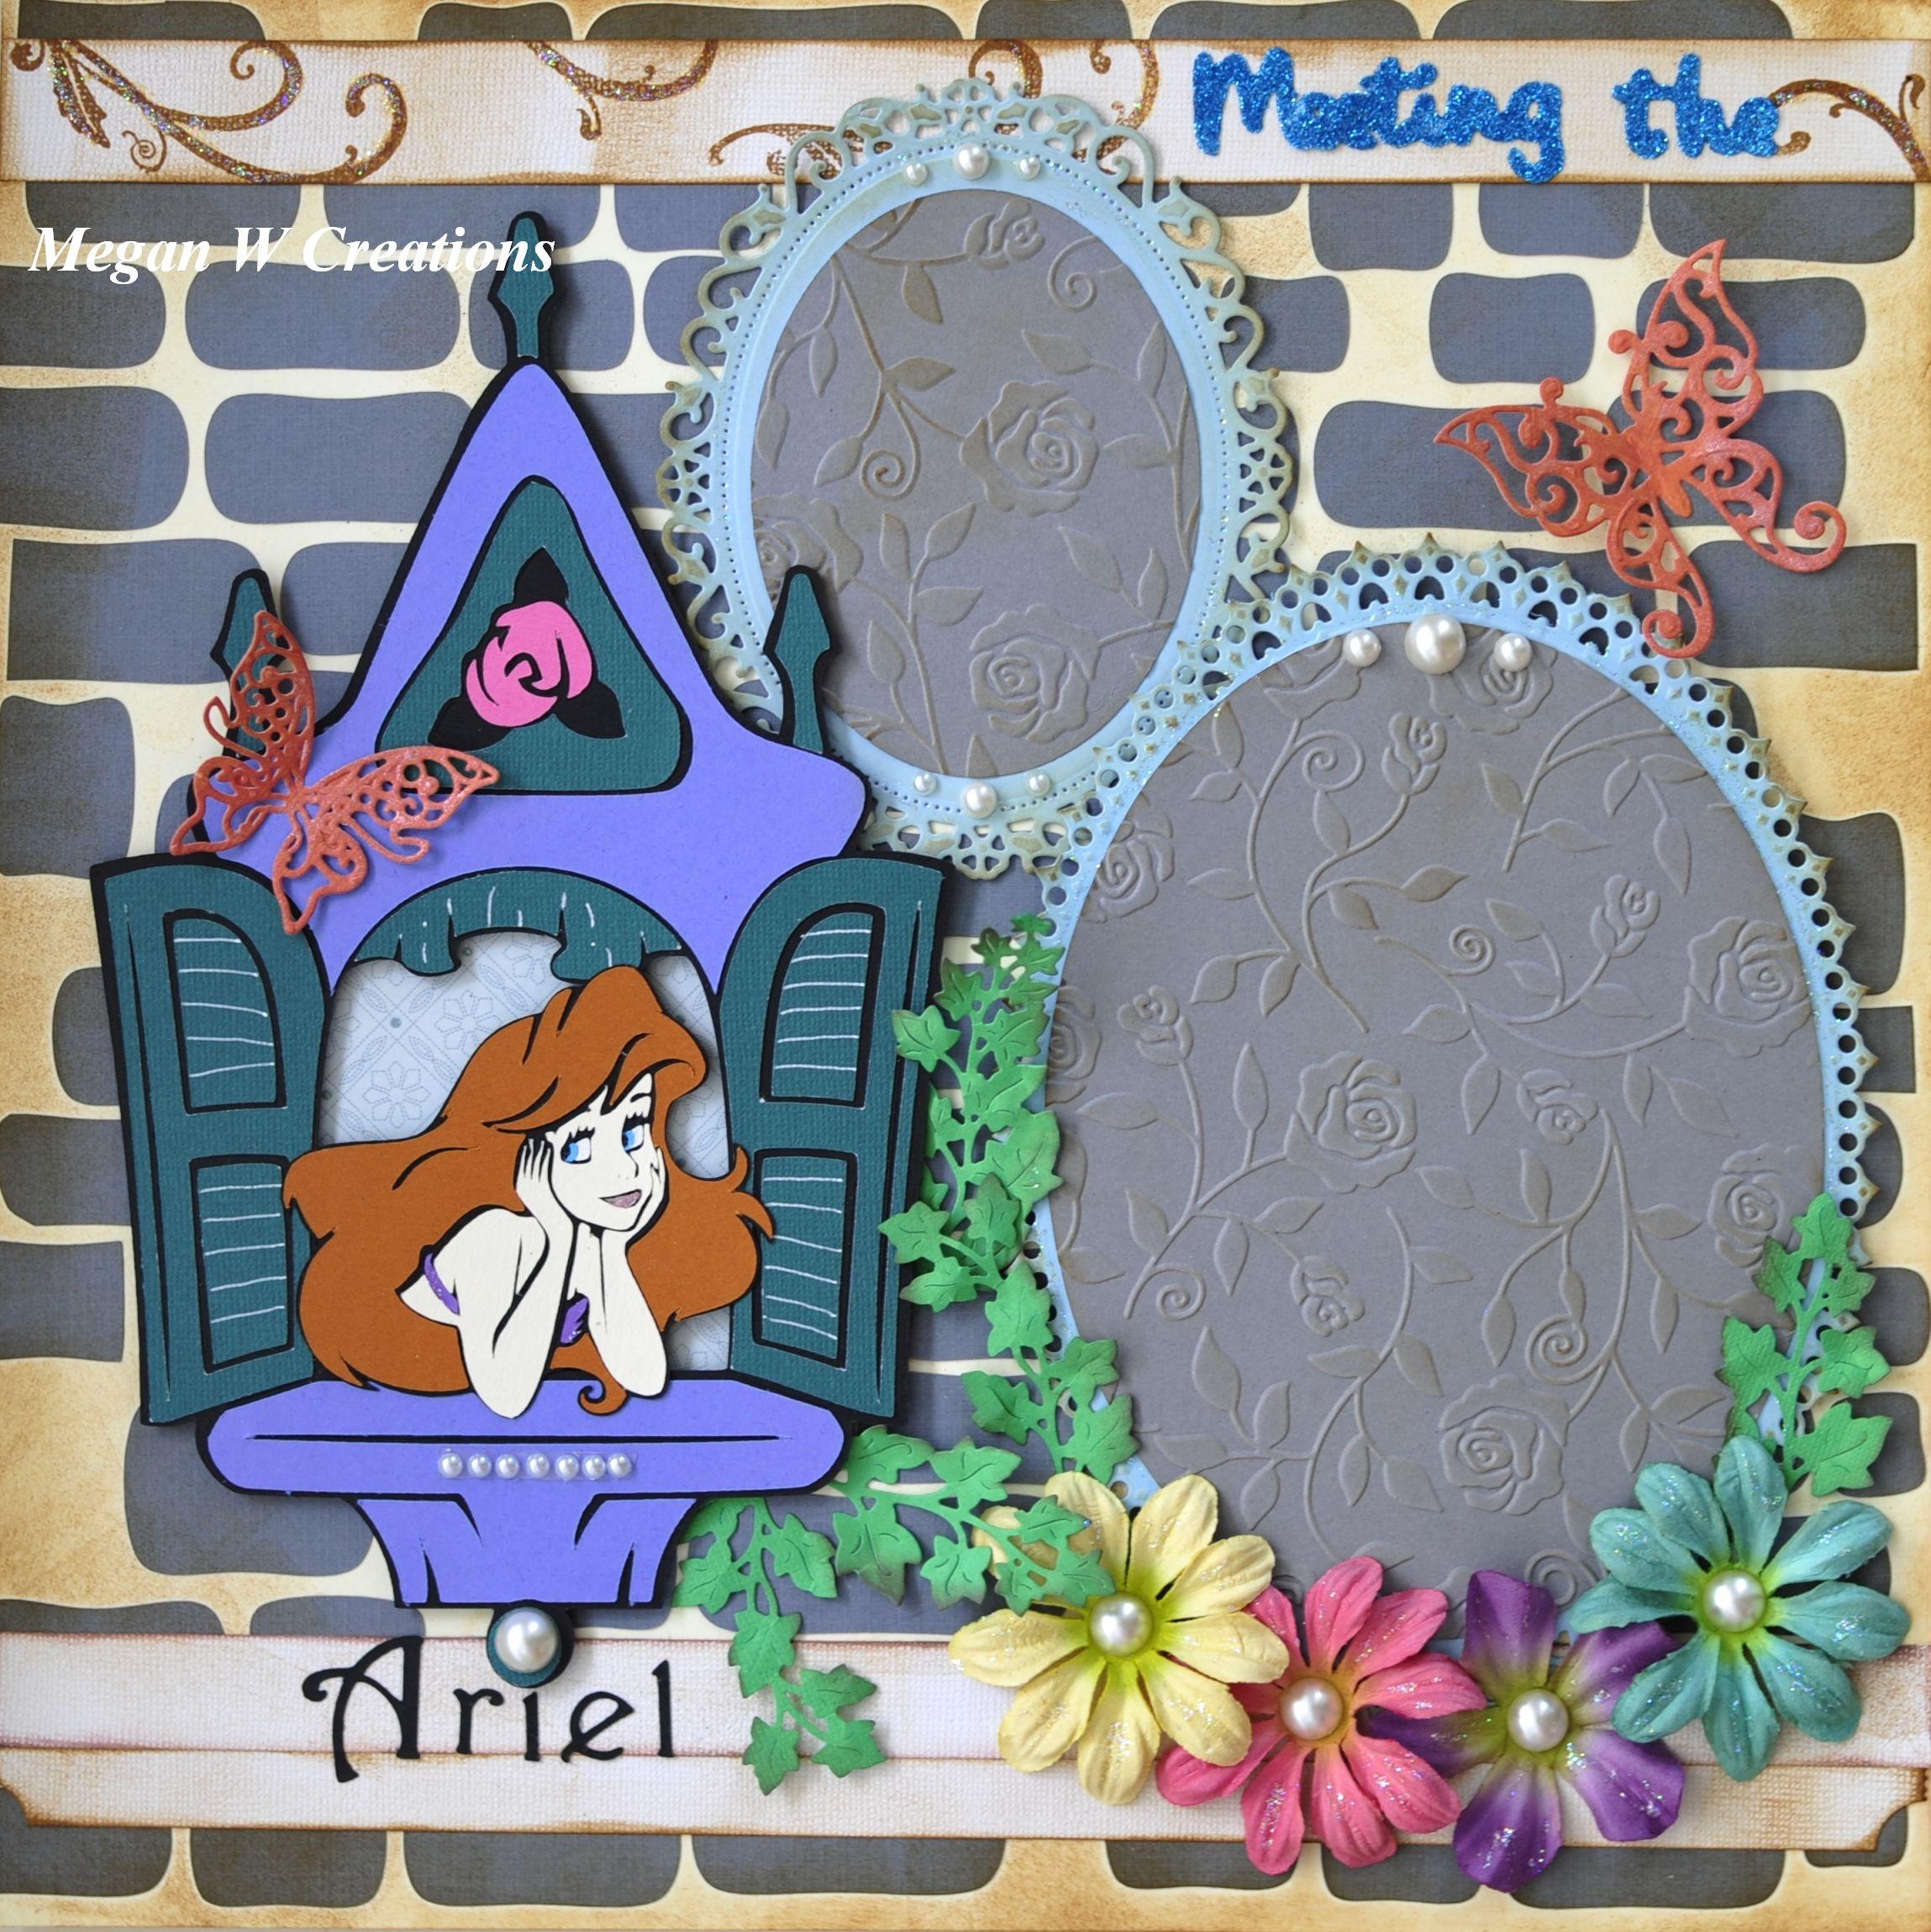 Jungle scrapbook ideas - Disney Princess Ariel In Little Mermaid Scrapbook Layout